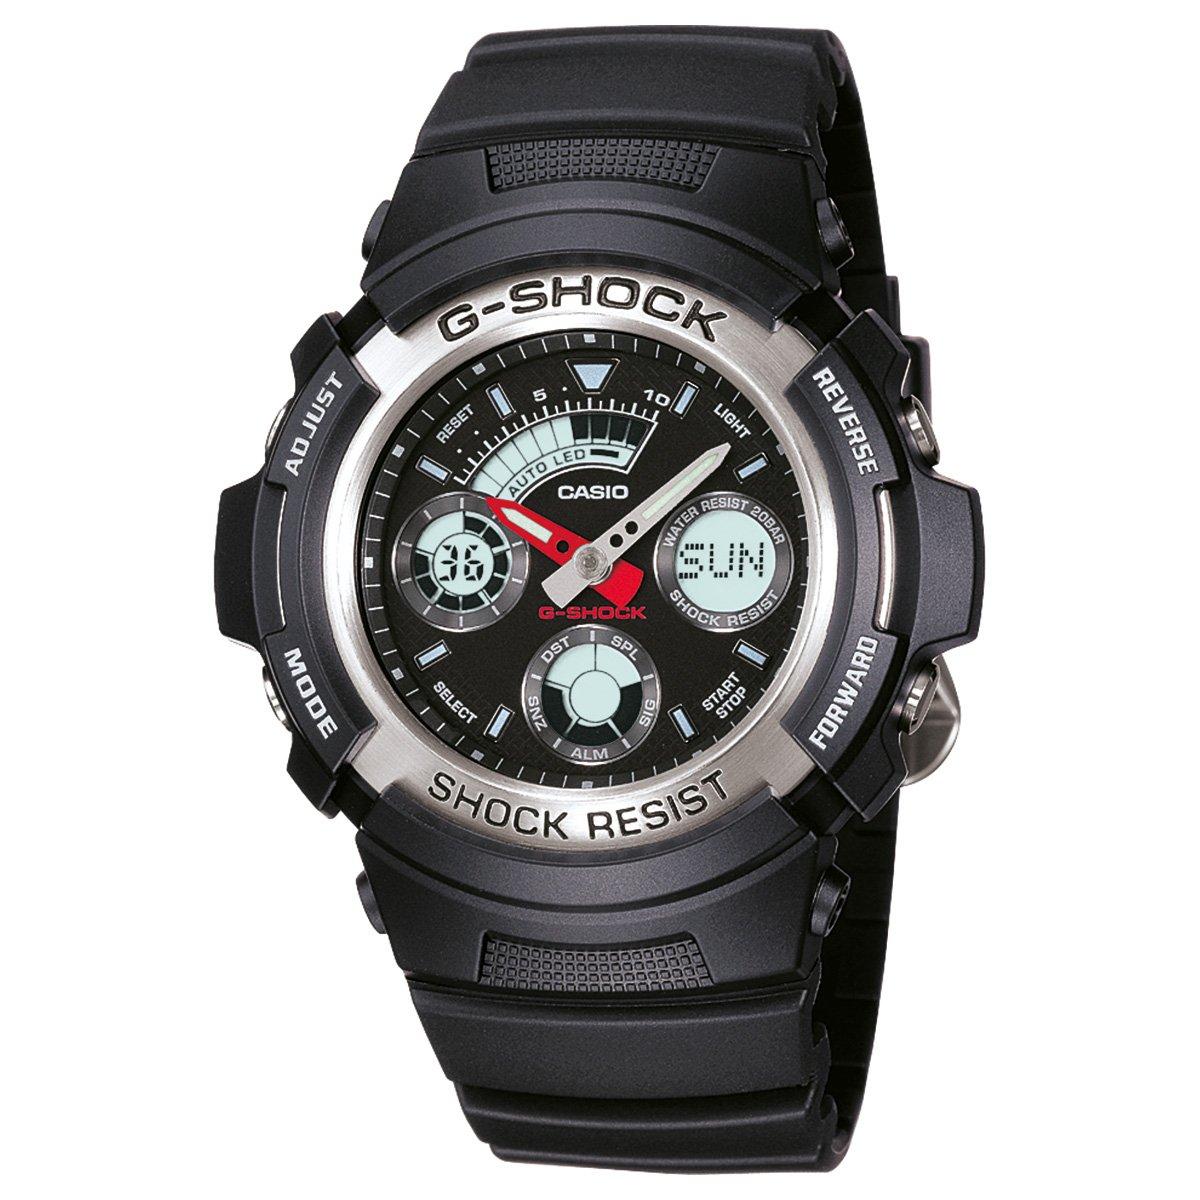 f5db03c17b3 Relógio Analógico Digital G-Shock AW-590-1ADR Masculino - Compre ...